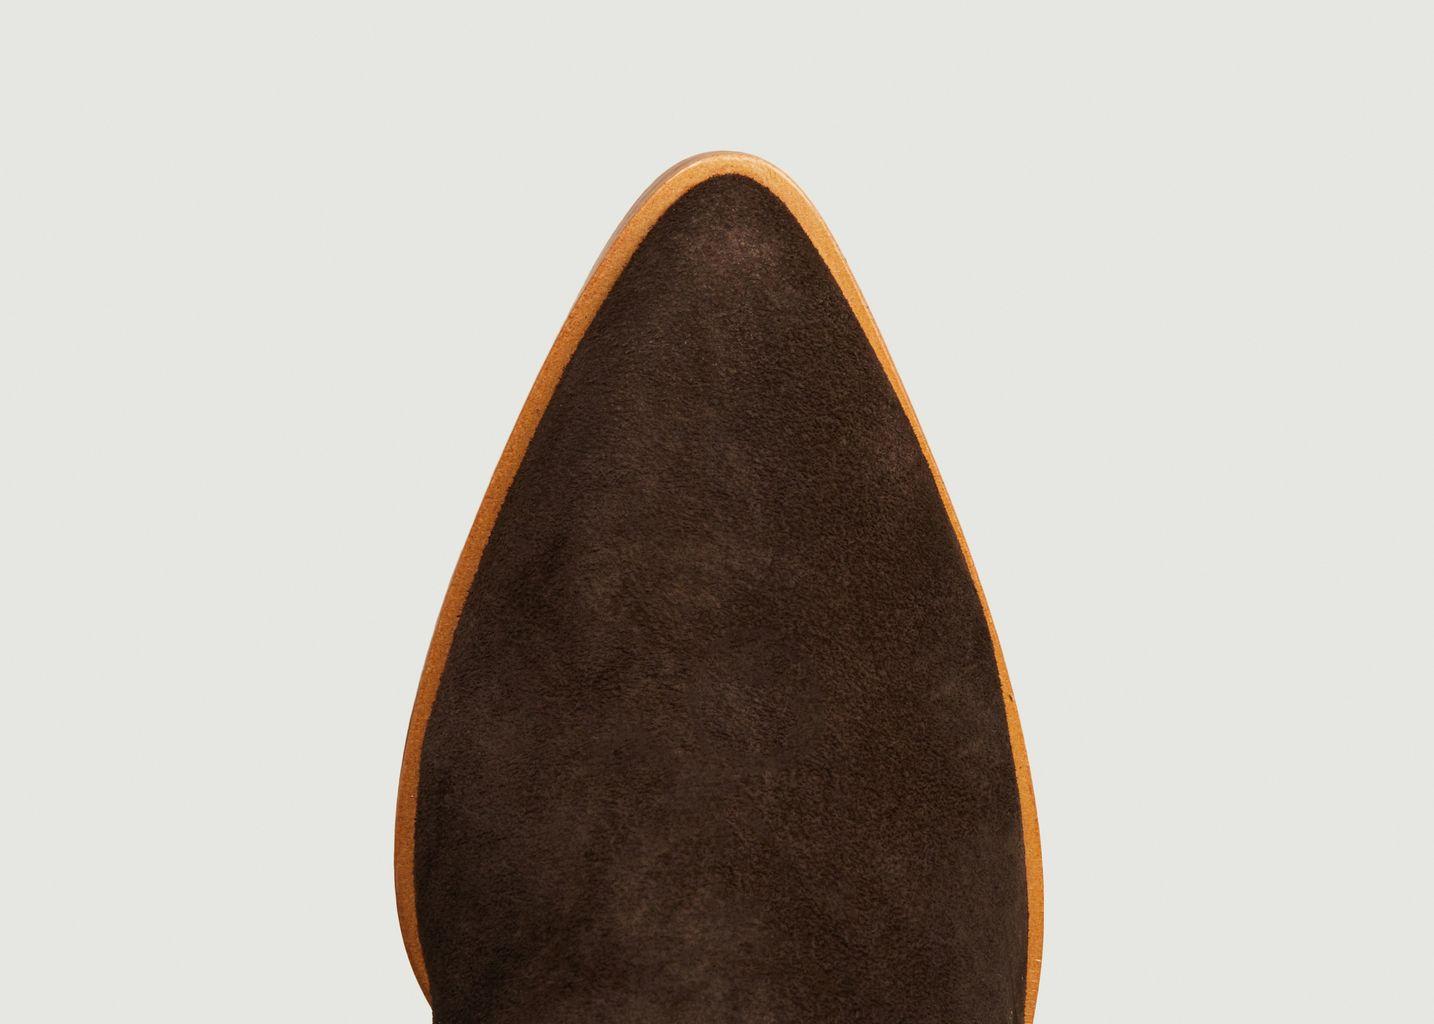 Bottines en cuir suédé Ecope - Avril Gau